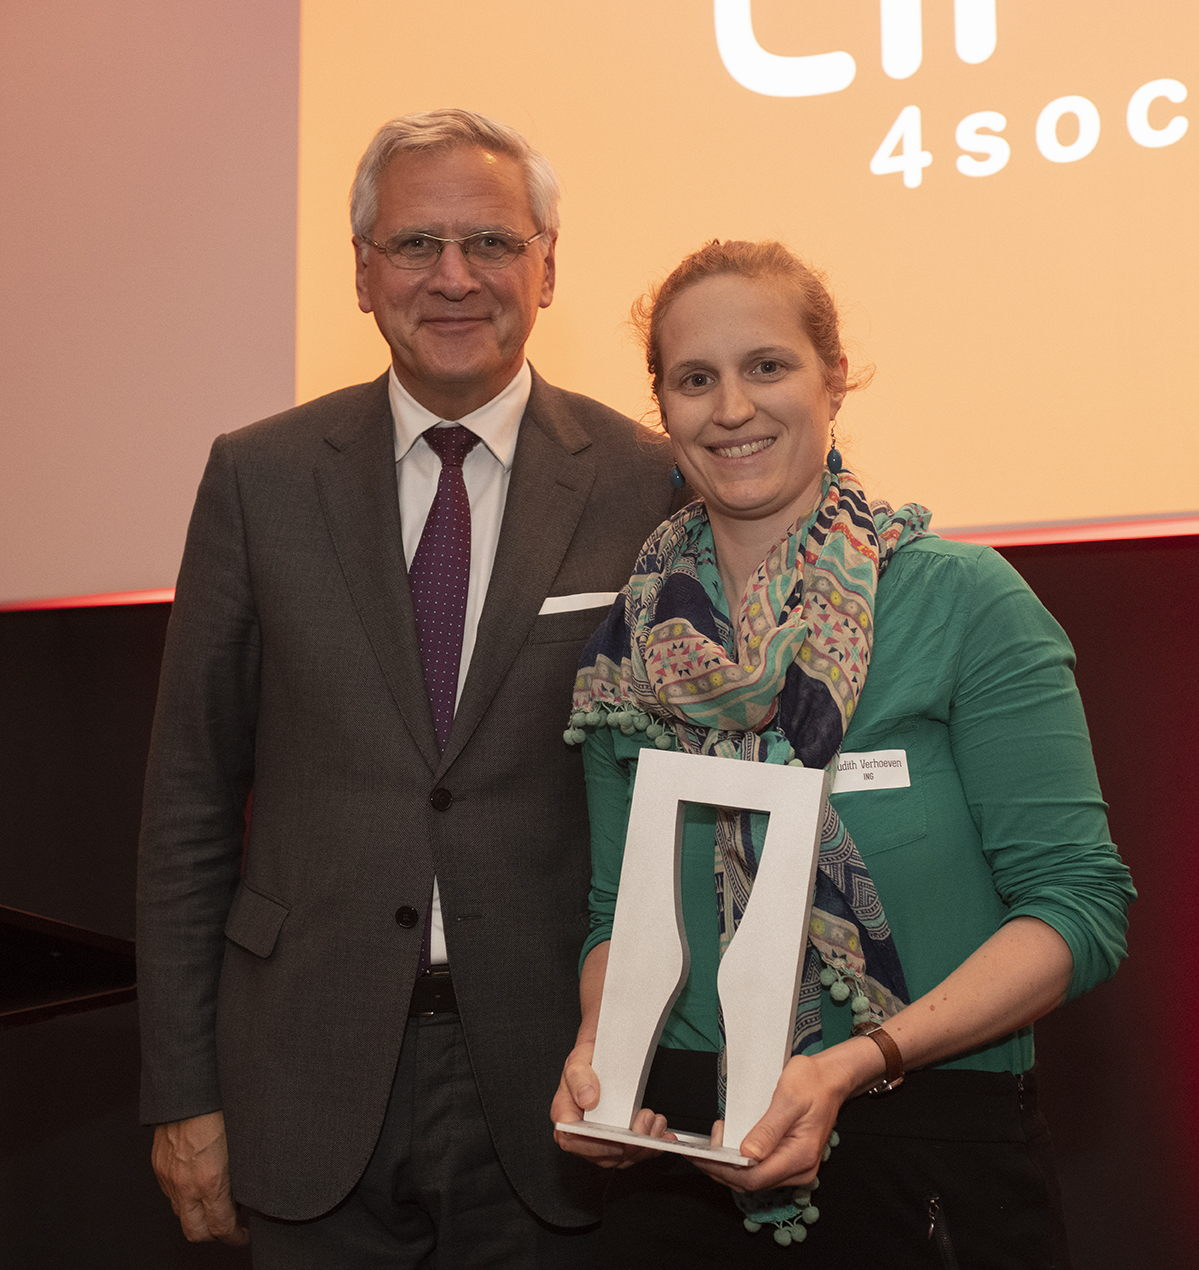 Vice-Premier Kris Peeters & Judith Verhoeven, Sustainability Expert ING Belgique